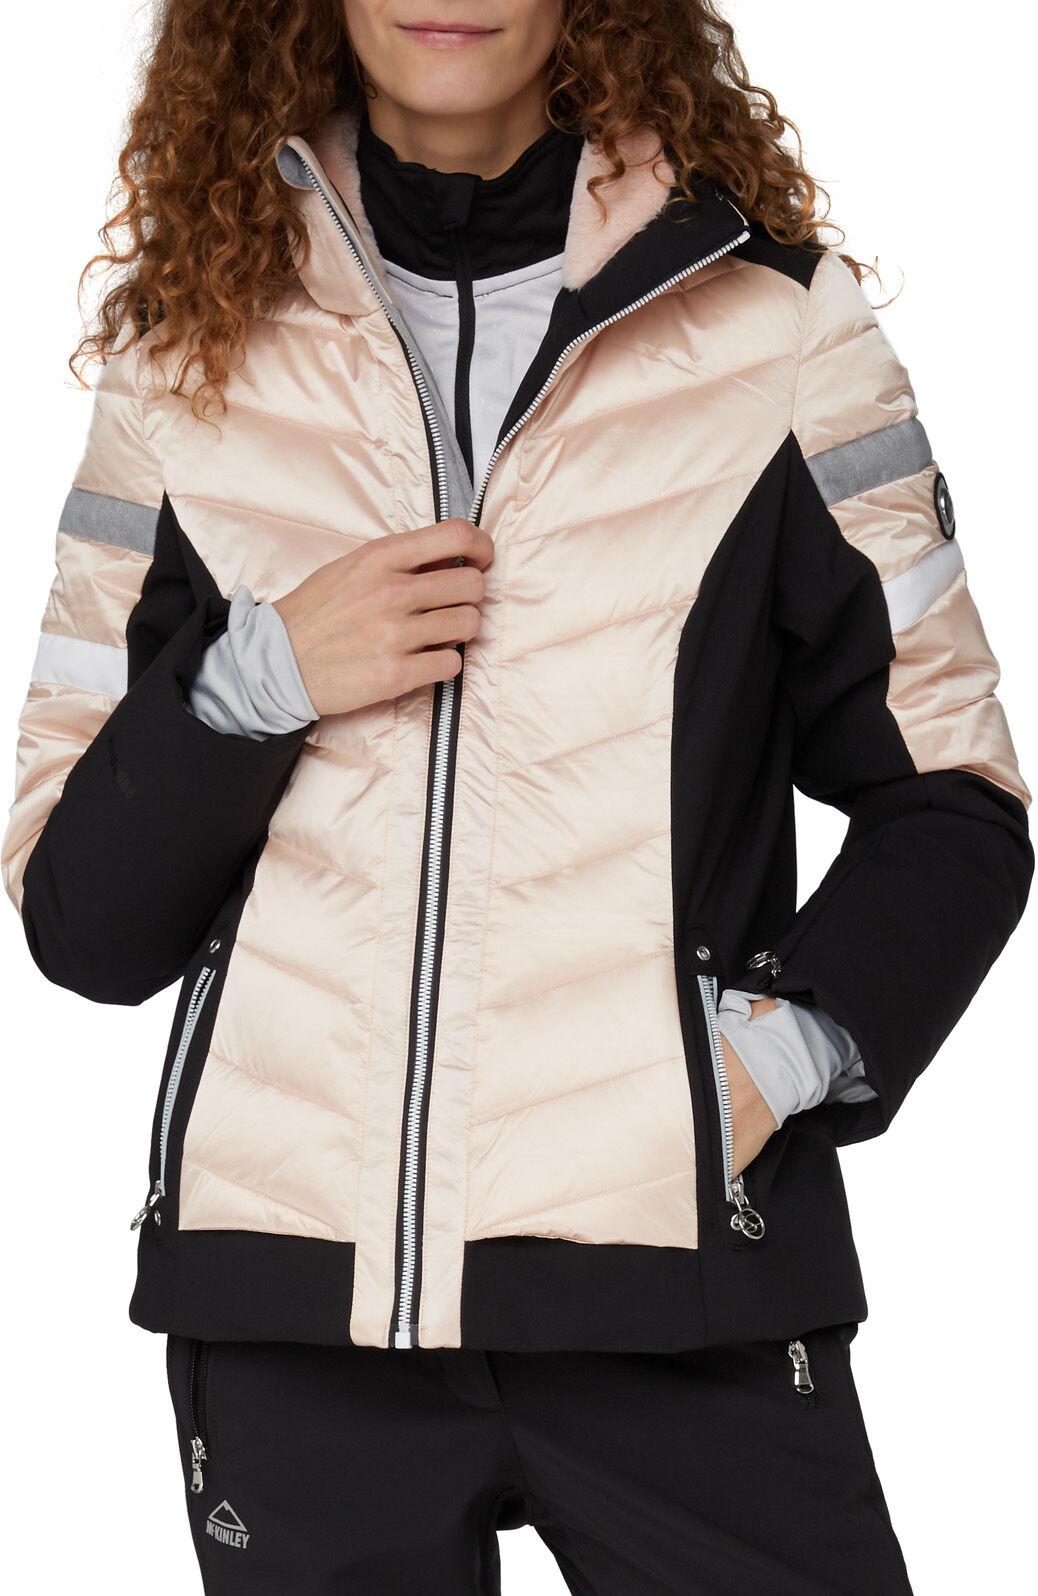 McKinley Danika Ski Jas Ski jassen Kleding Wintersport